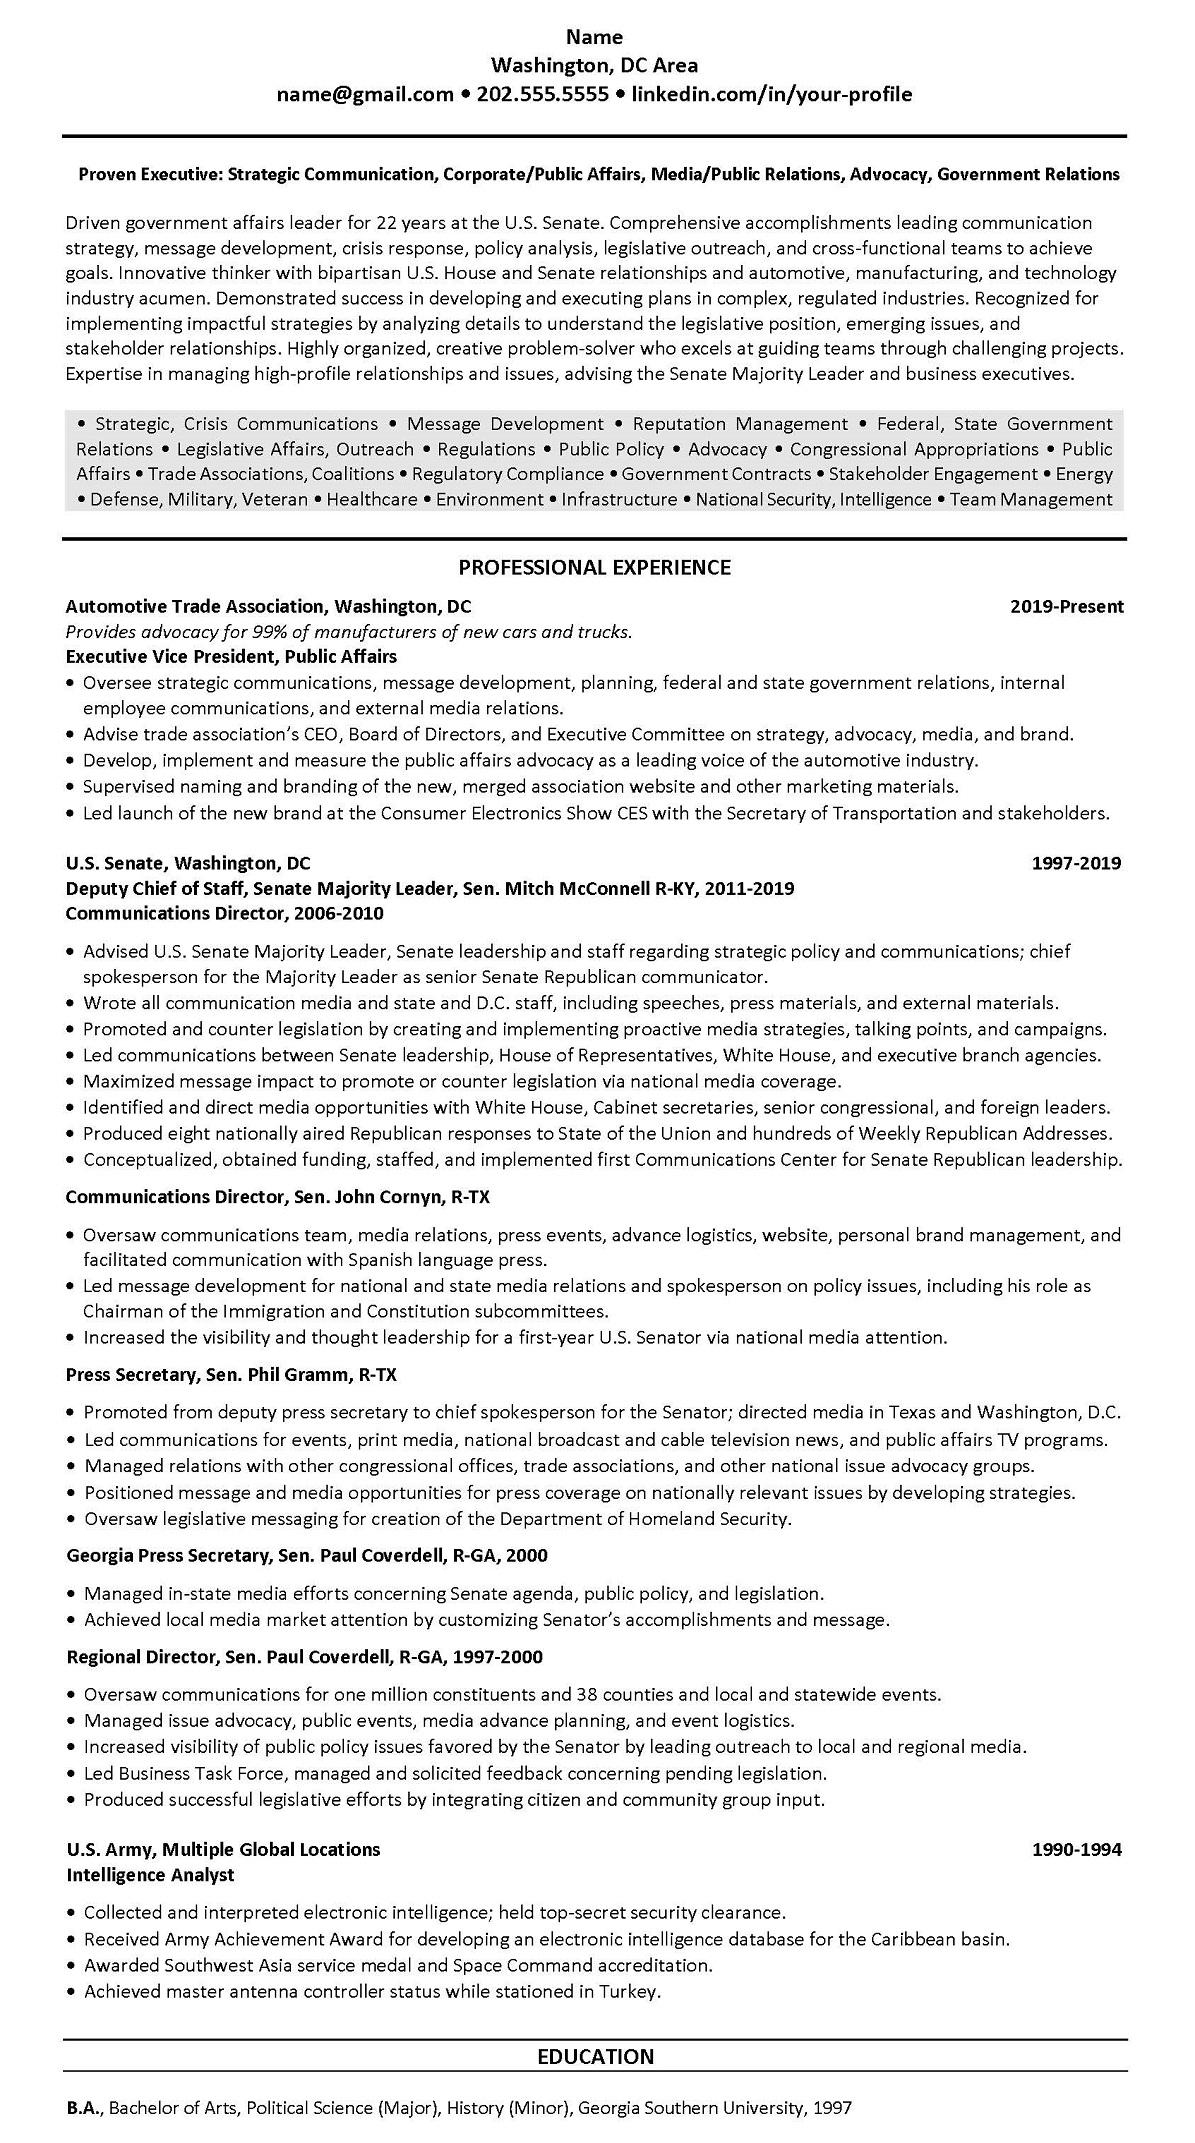 Resume 2097 210414